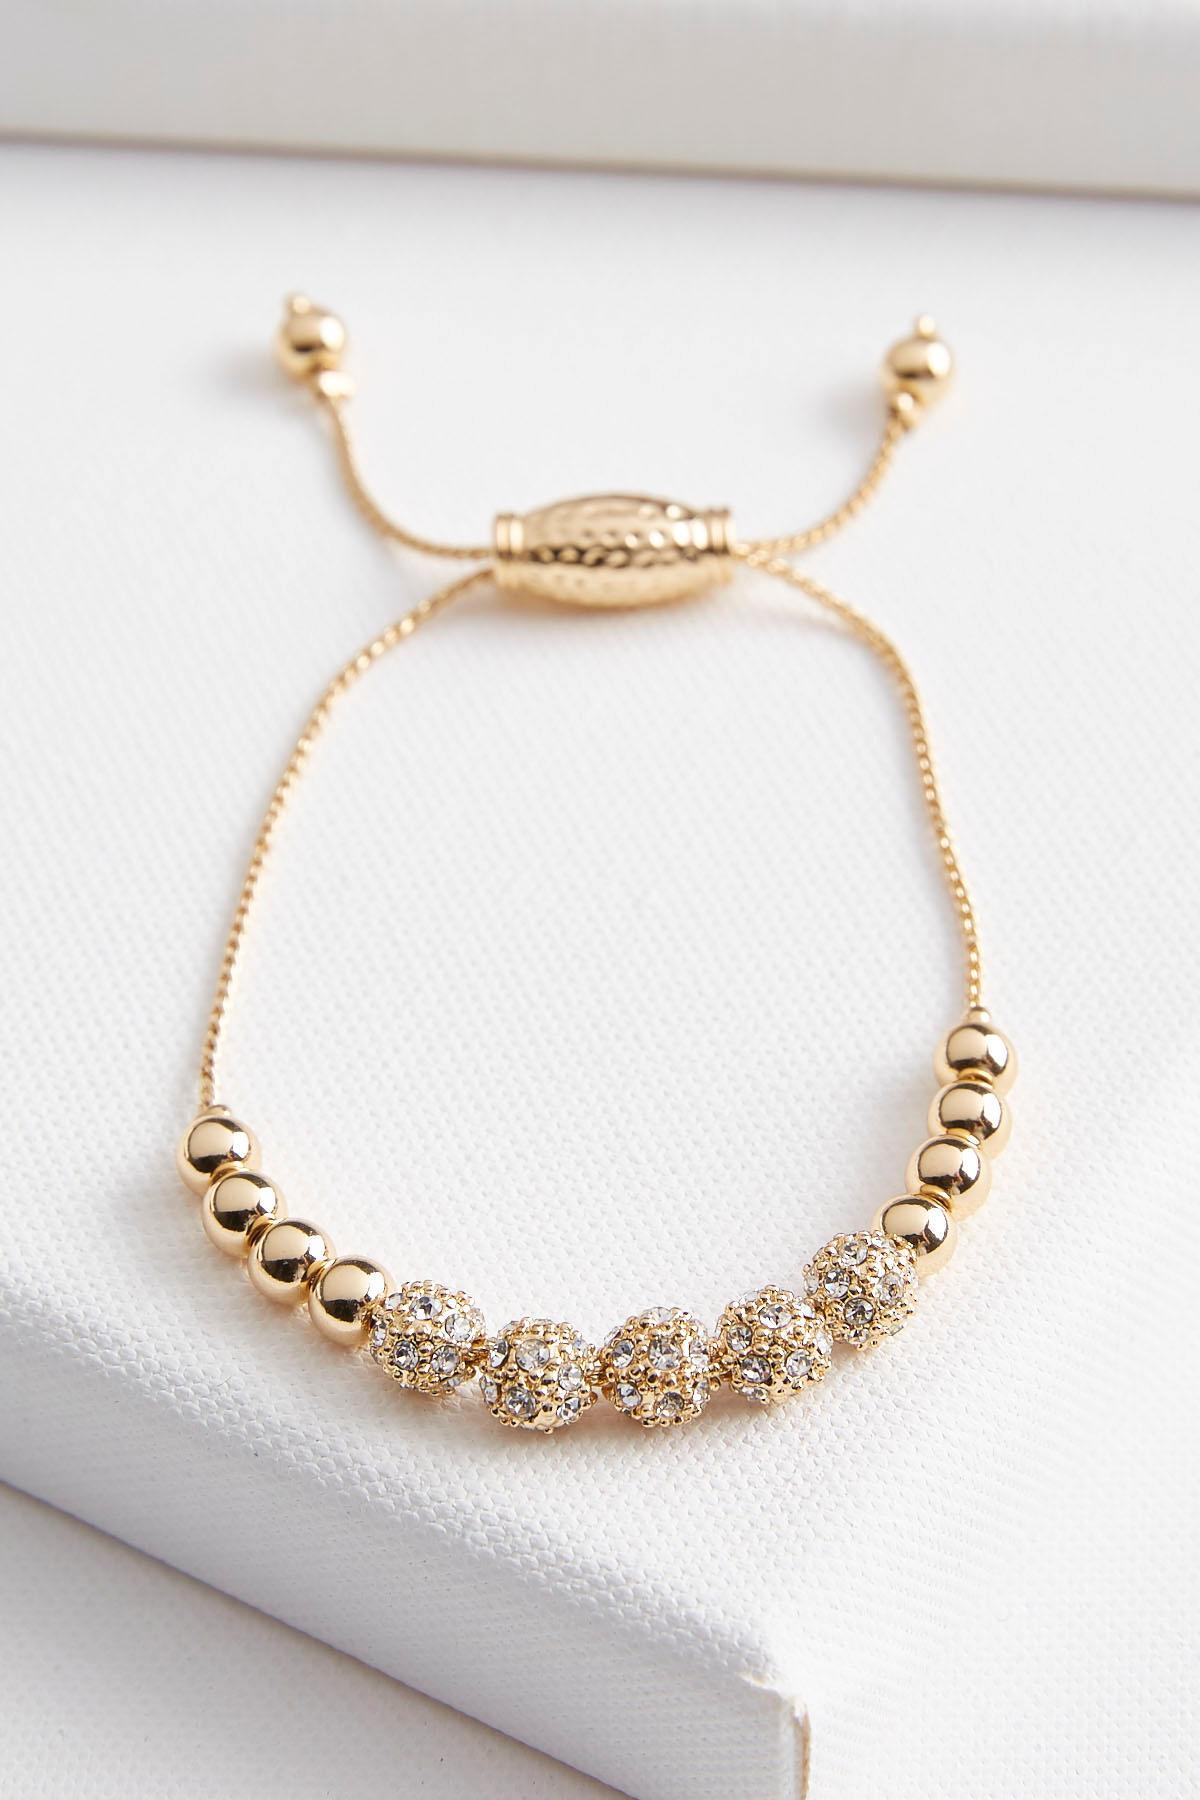 Beaded Pave Ball Bracelet